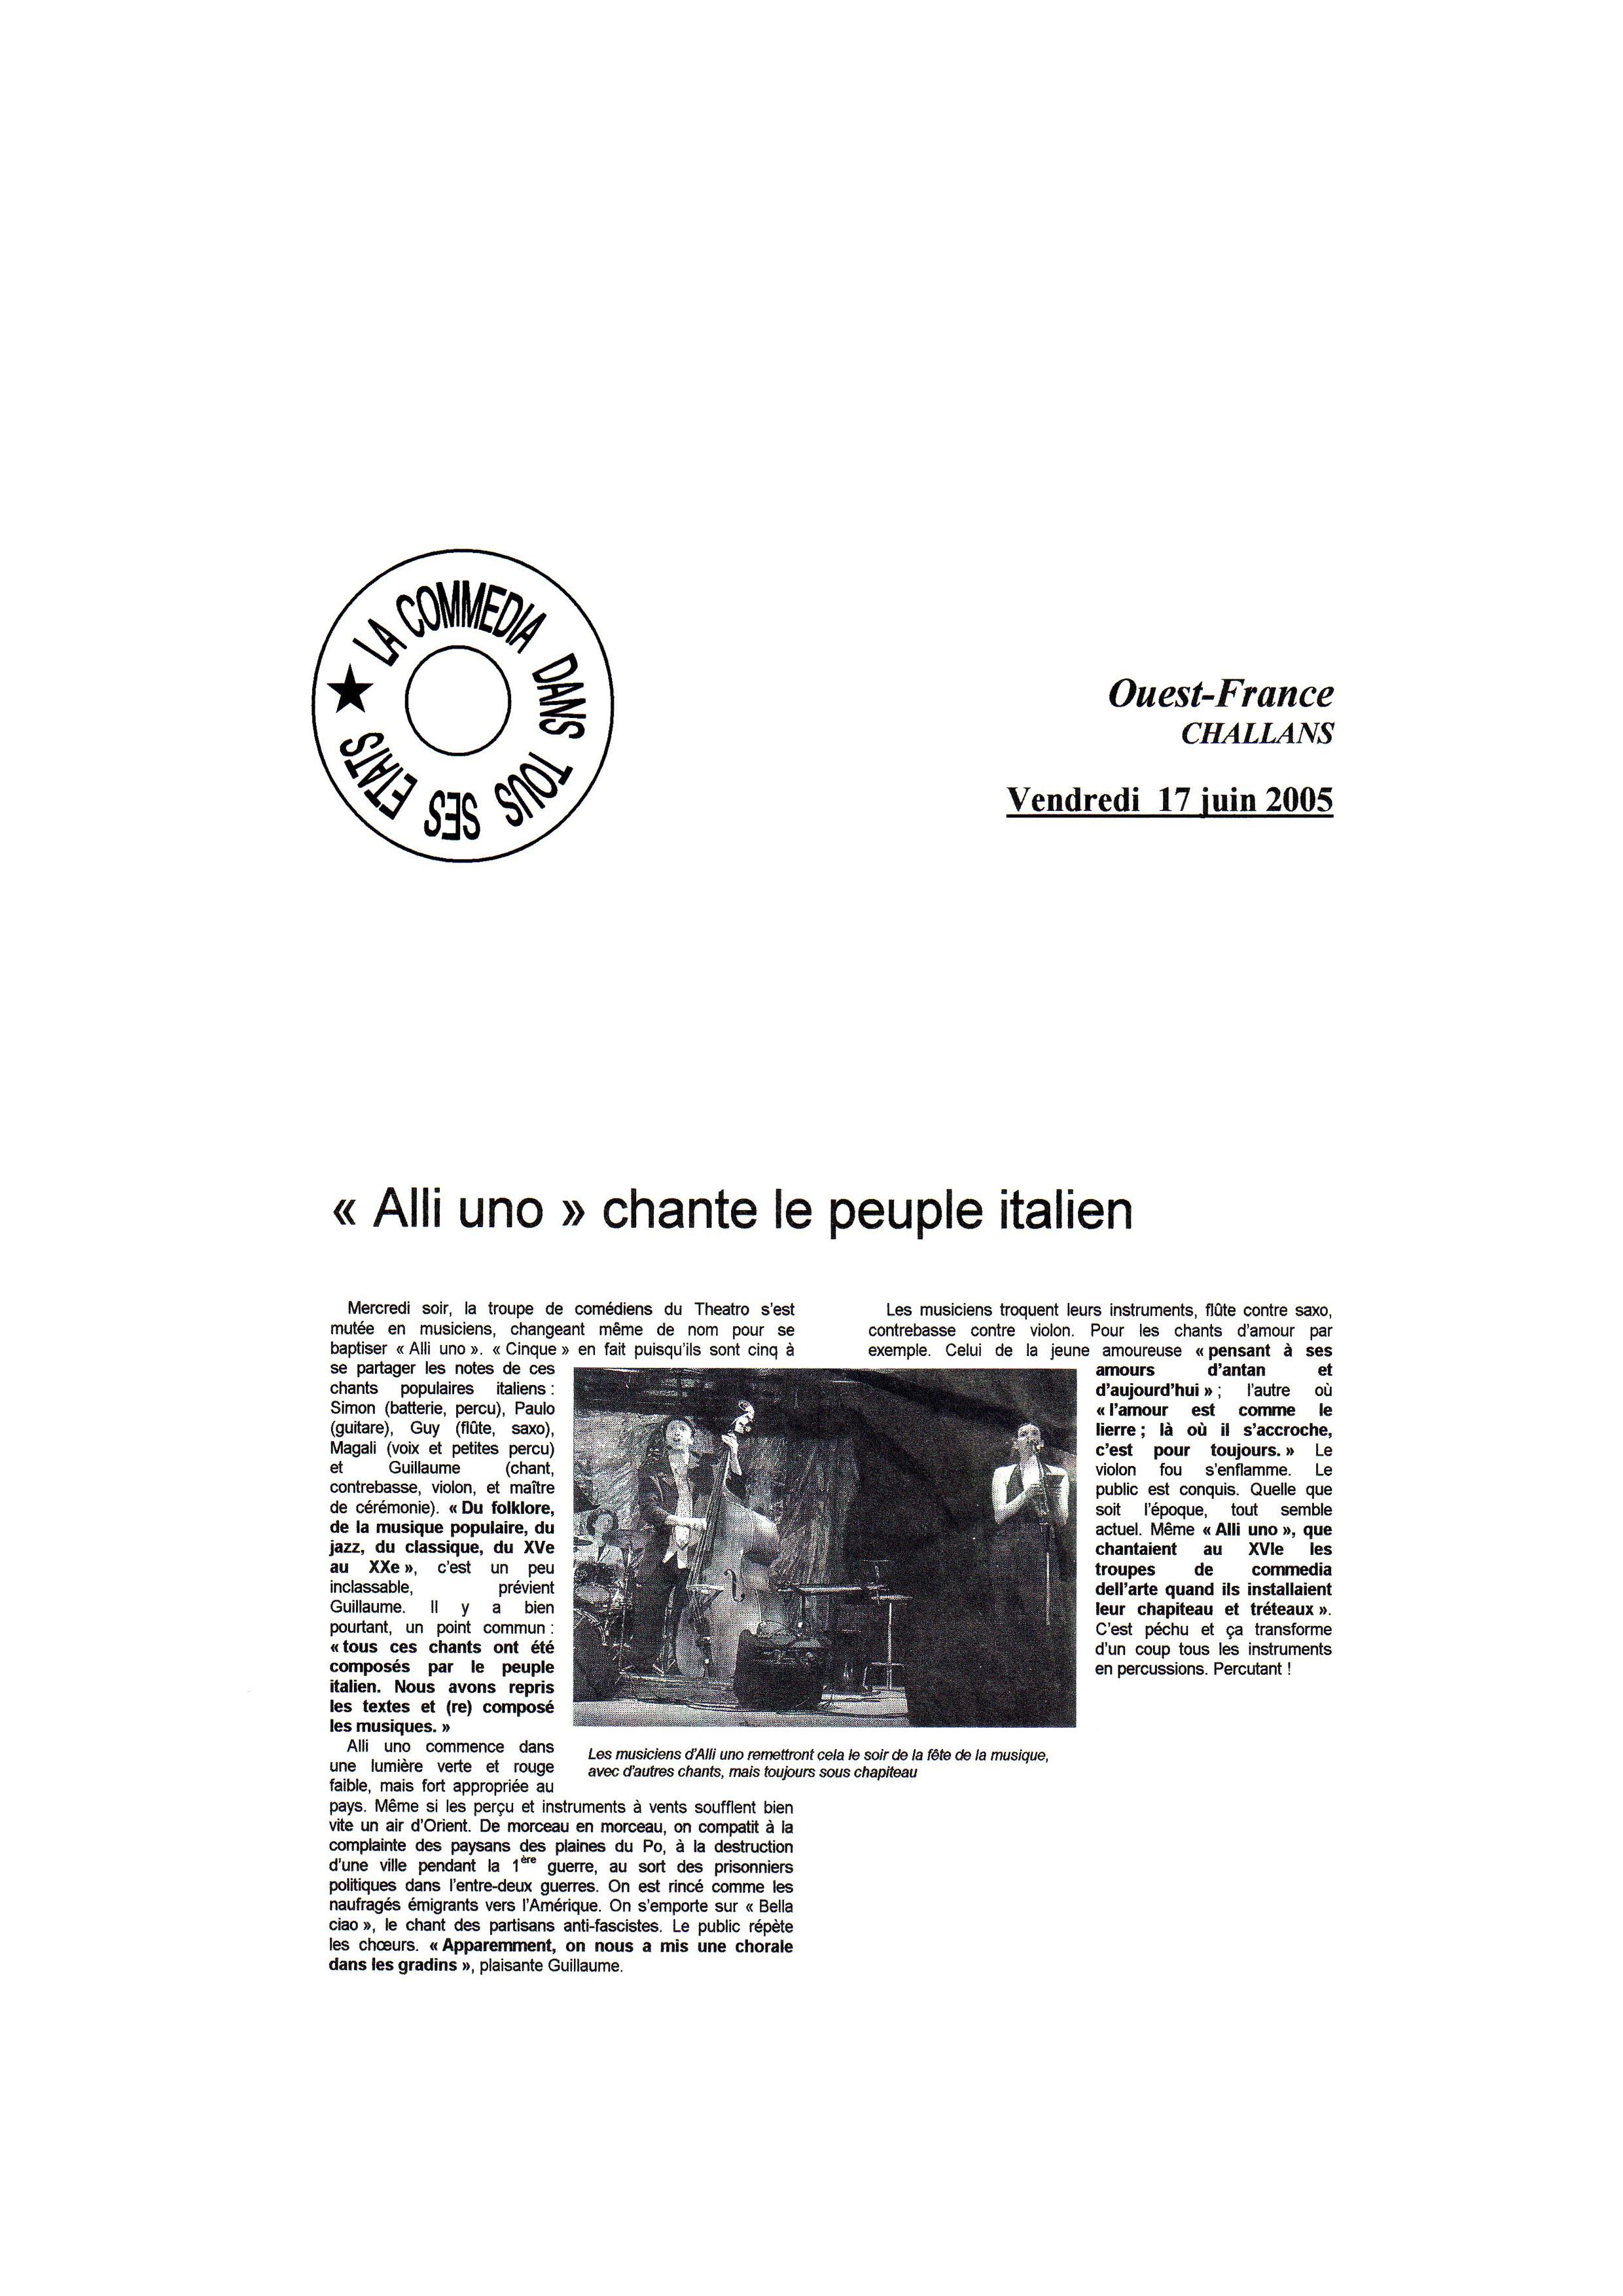 Challans 17.06.05.jpg